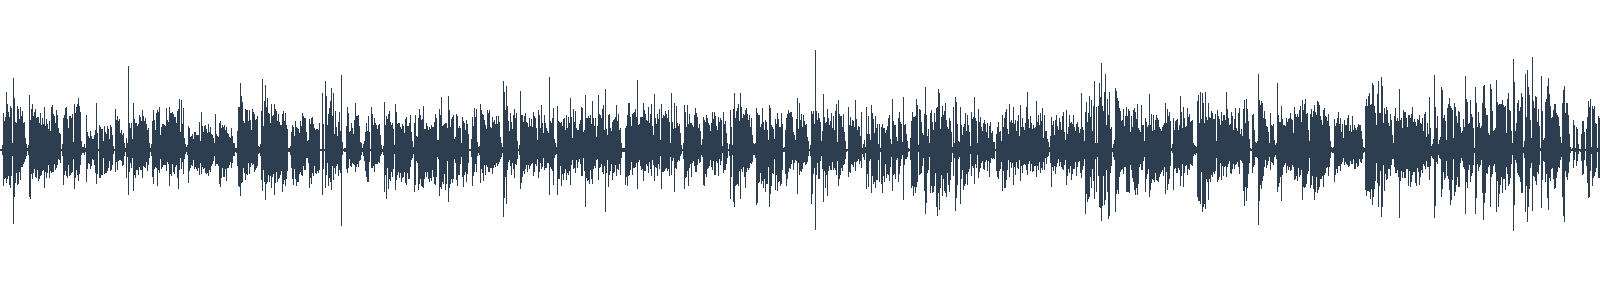 Zošidlo a hon na obludu waveform